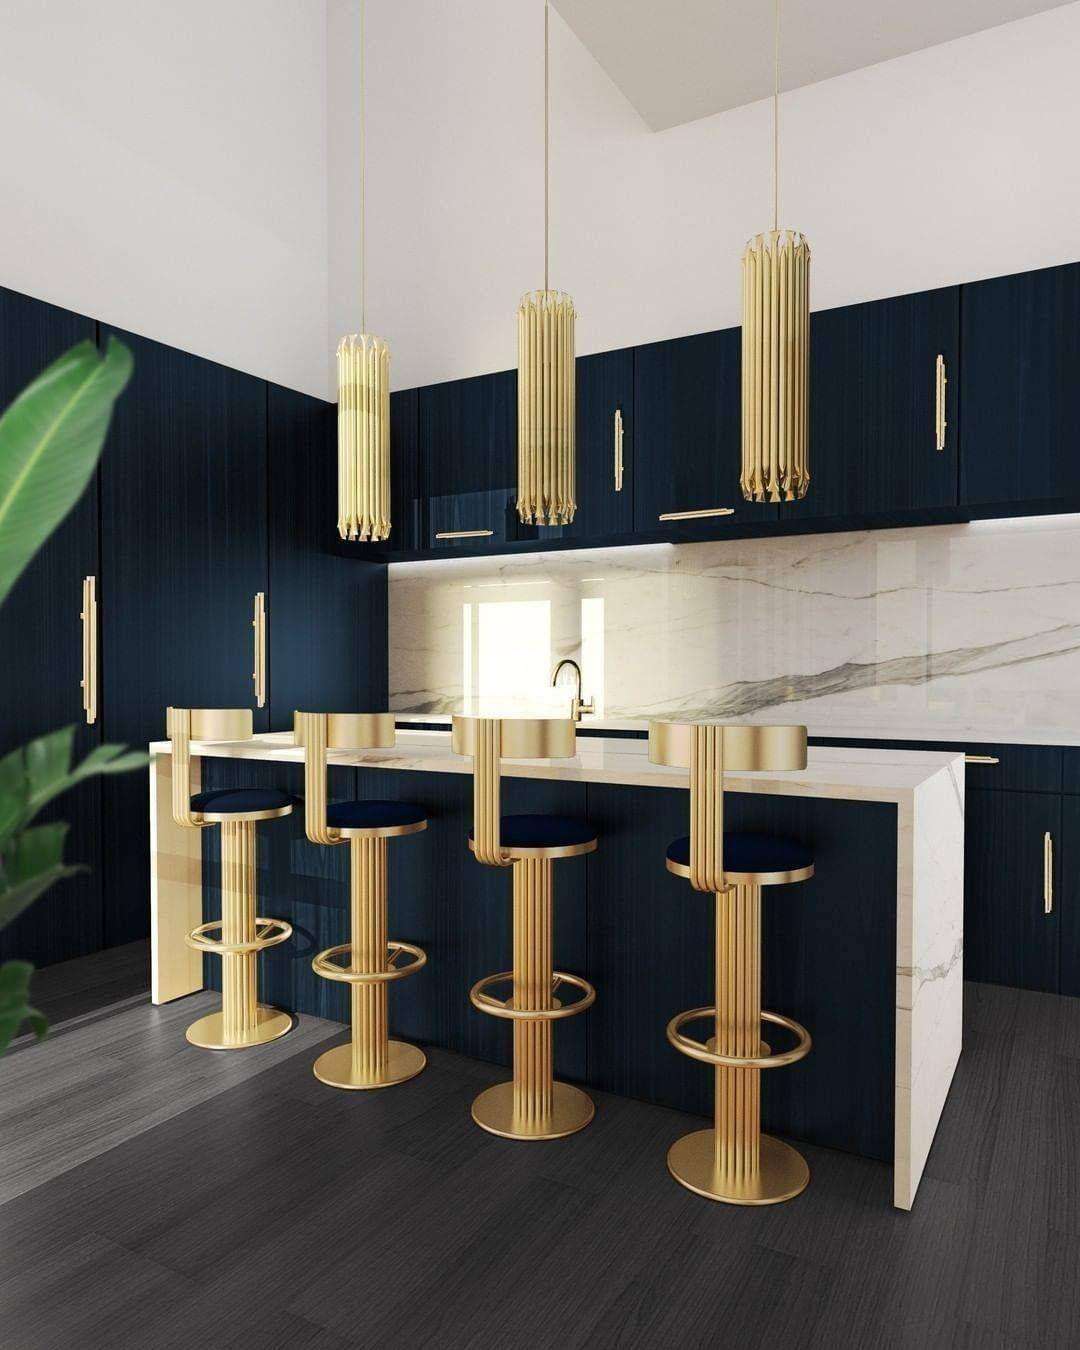 kitchen decor ideas home inspiration ideas